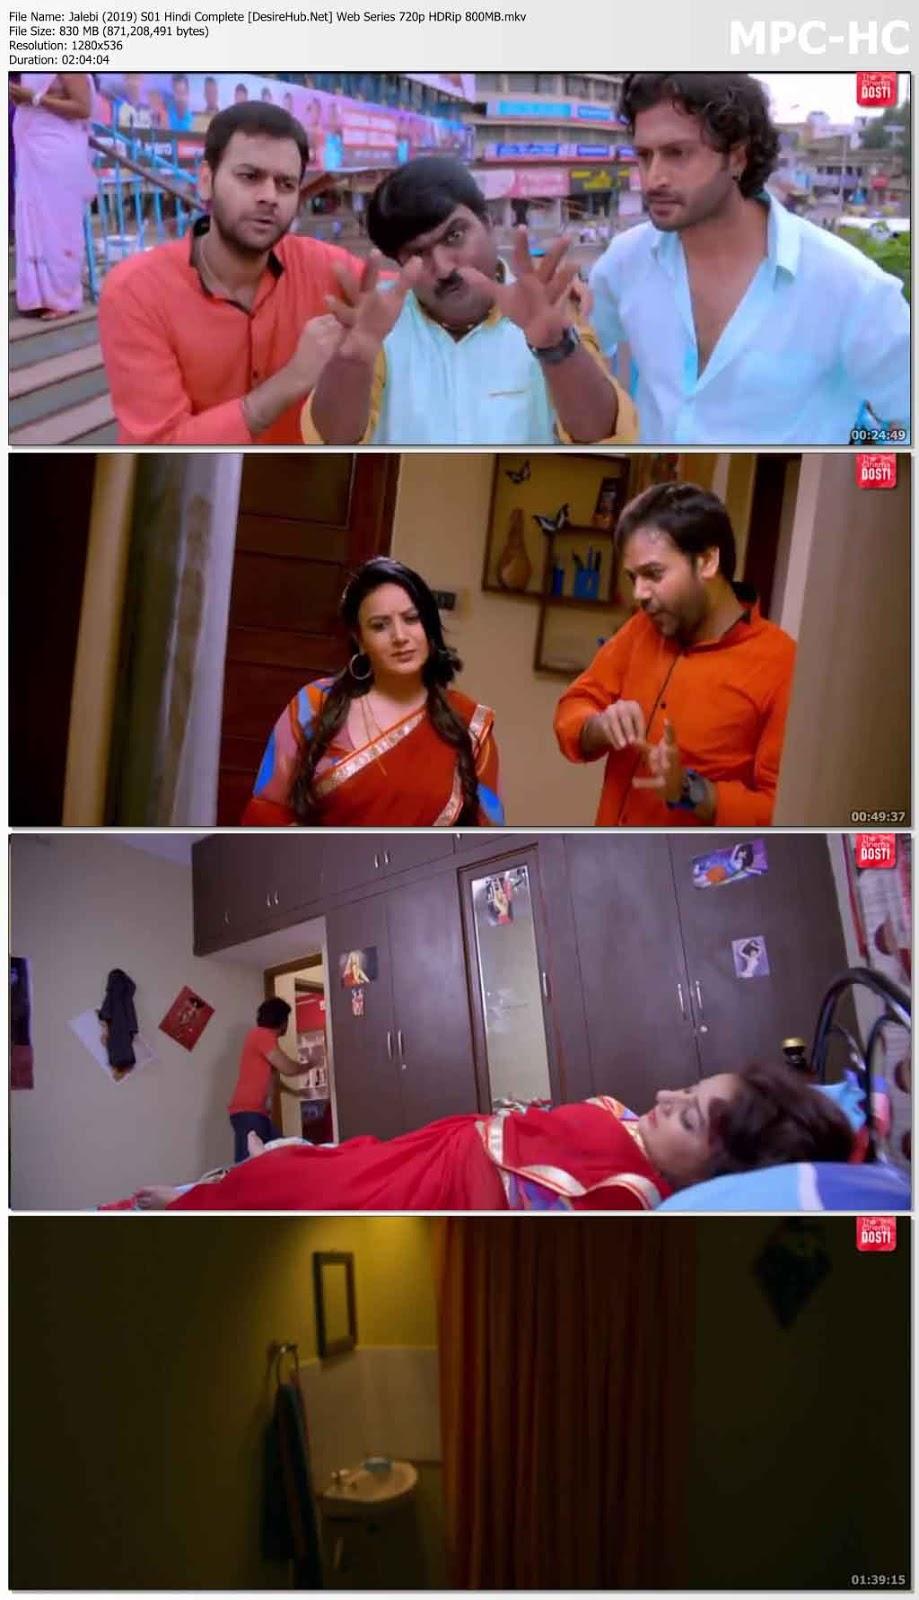 [18+] Jalebi 2019 S01 Hindi Complete Web Series 720p HDRip 800MB Desirehub